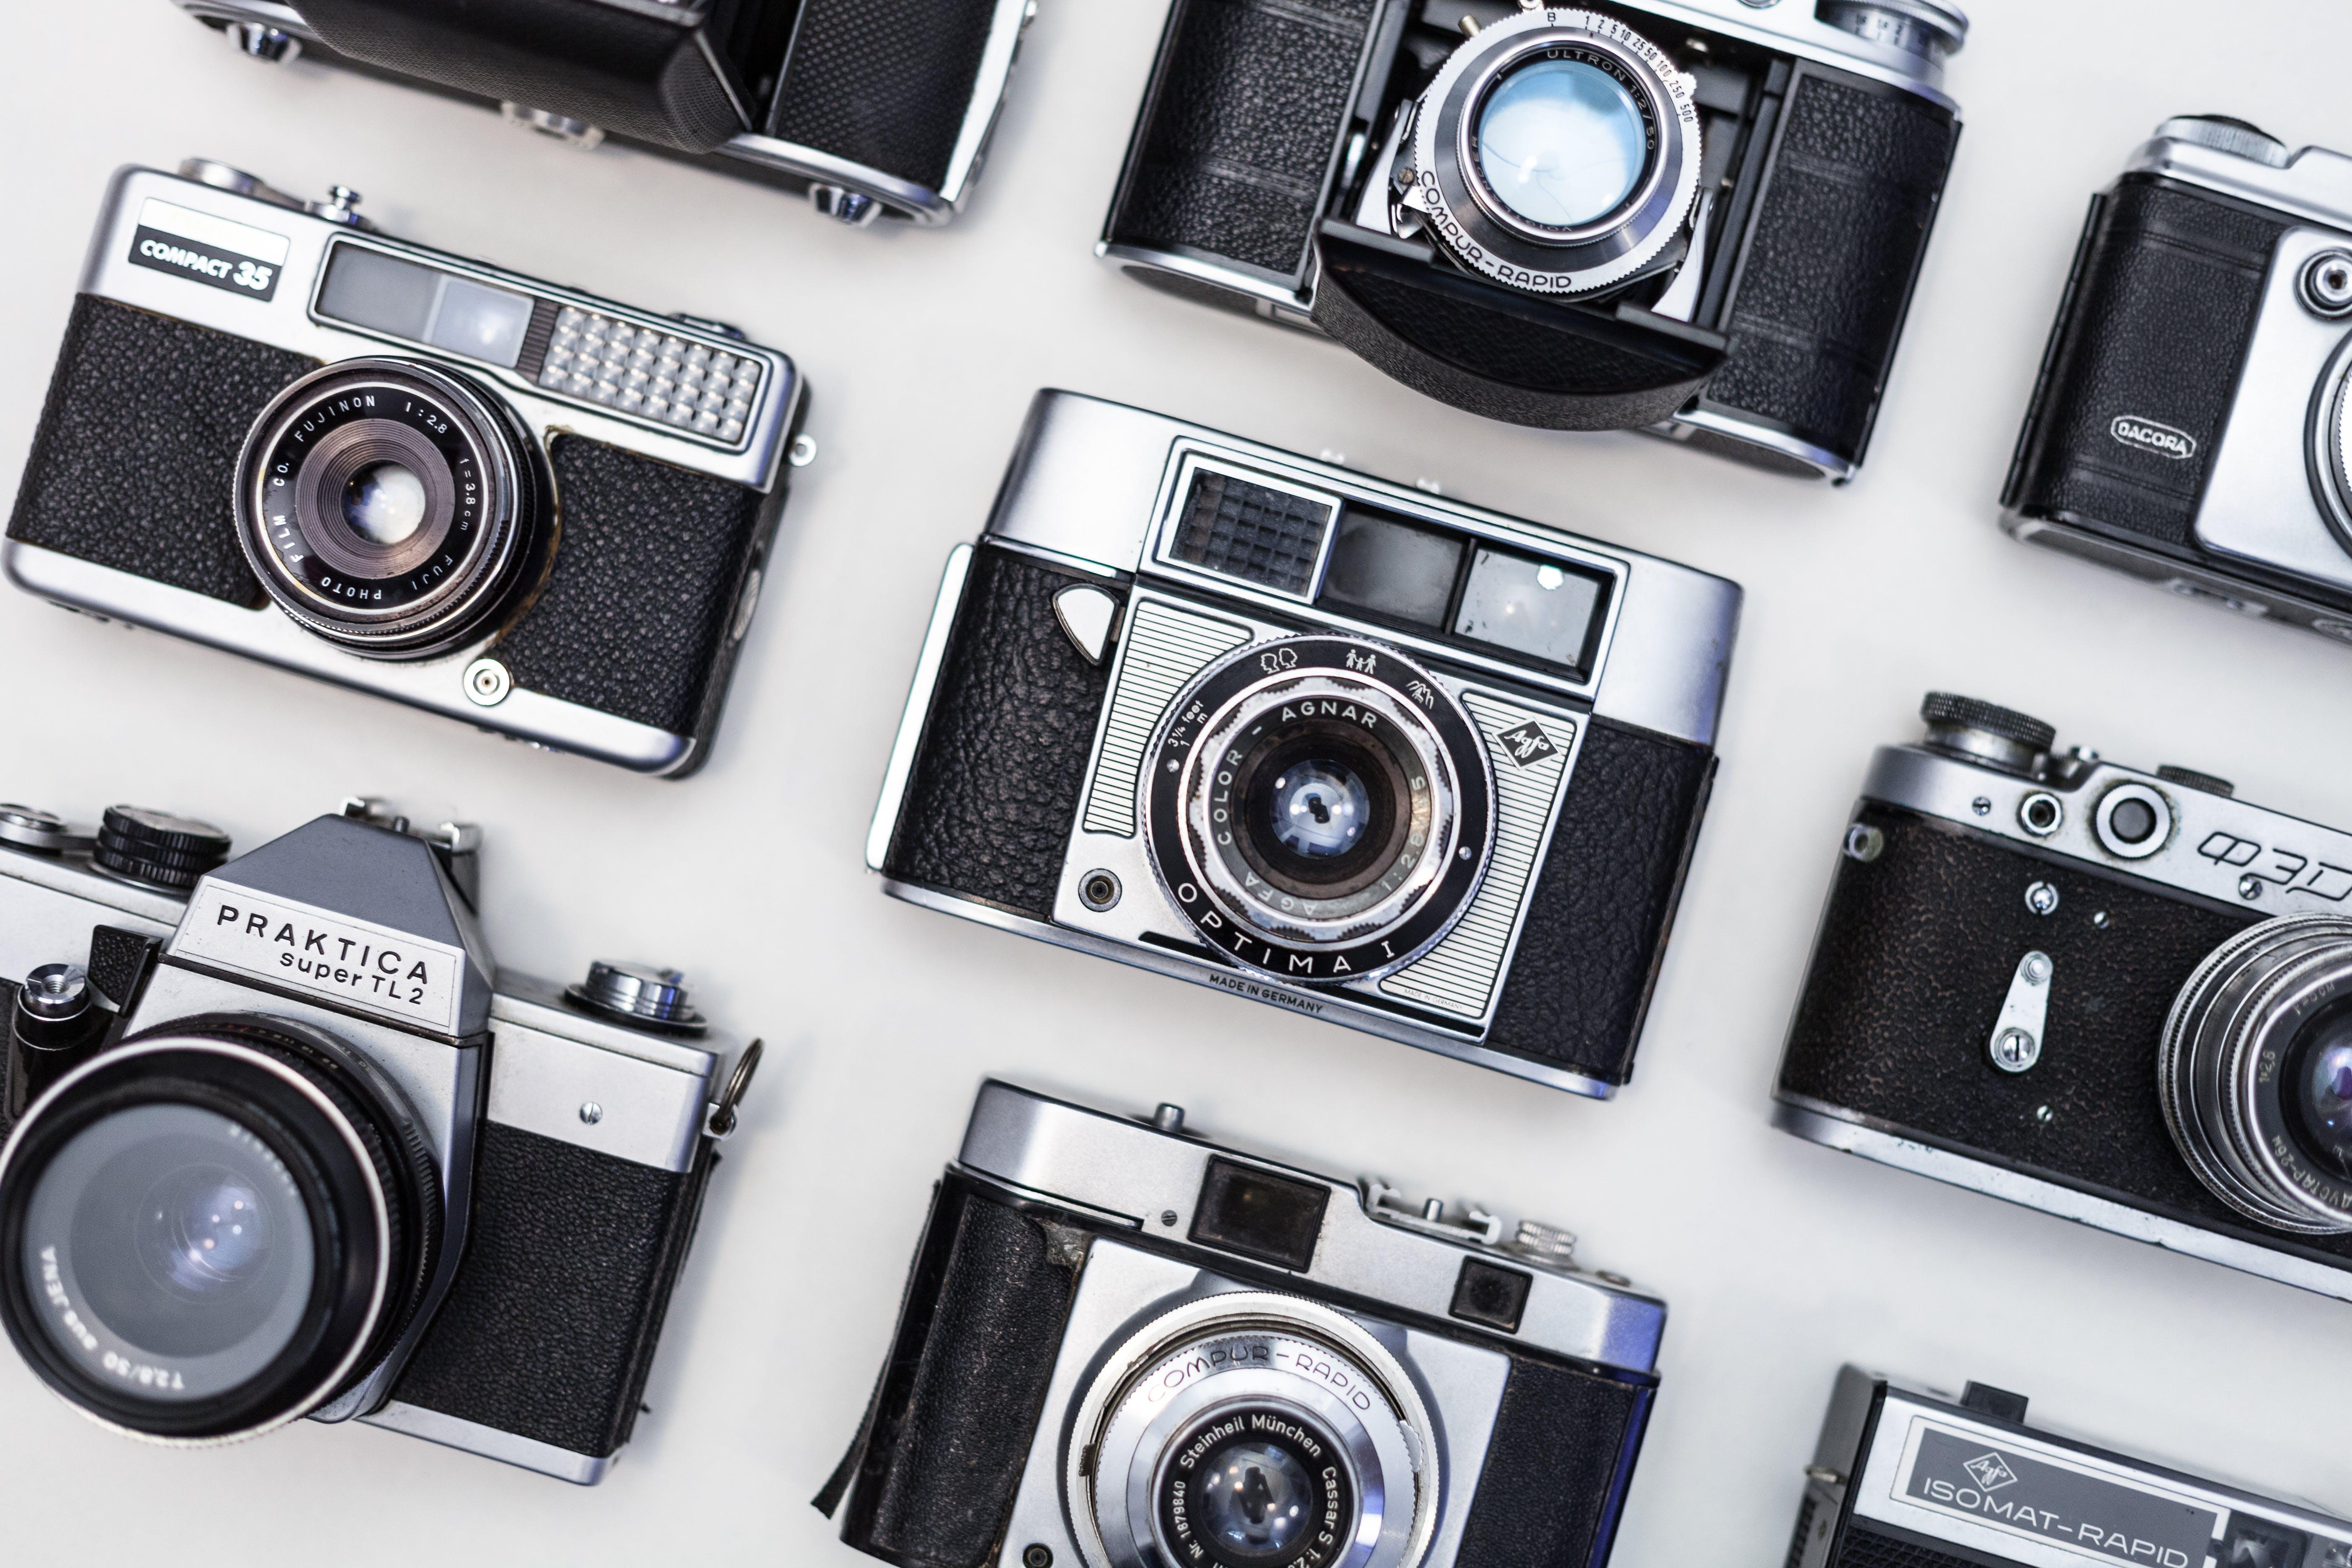 Nine Gray-and-black Land Cameras